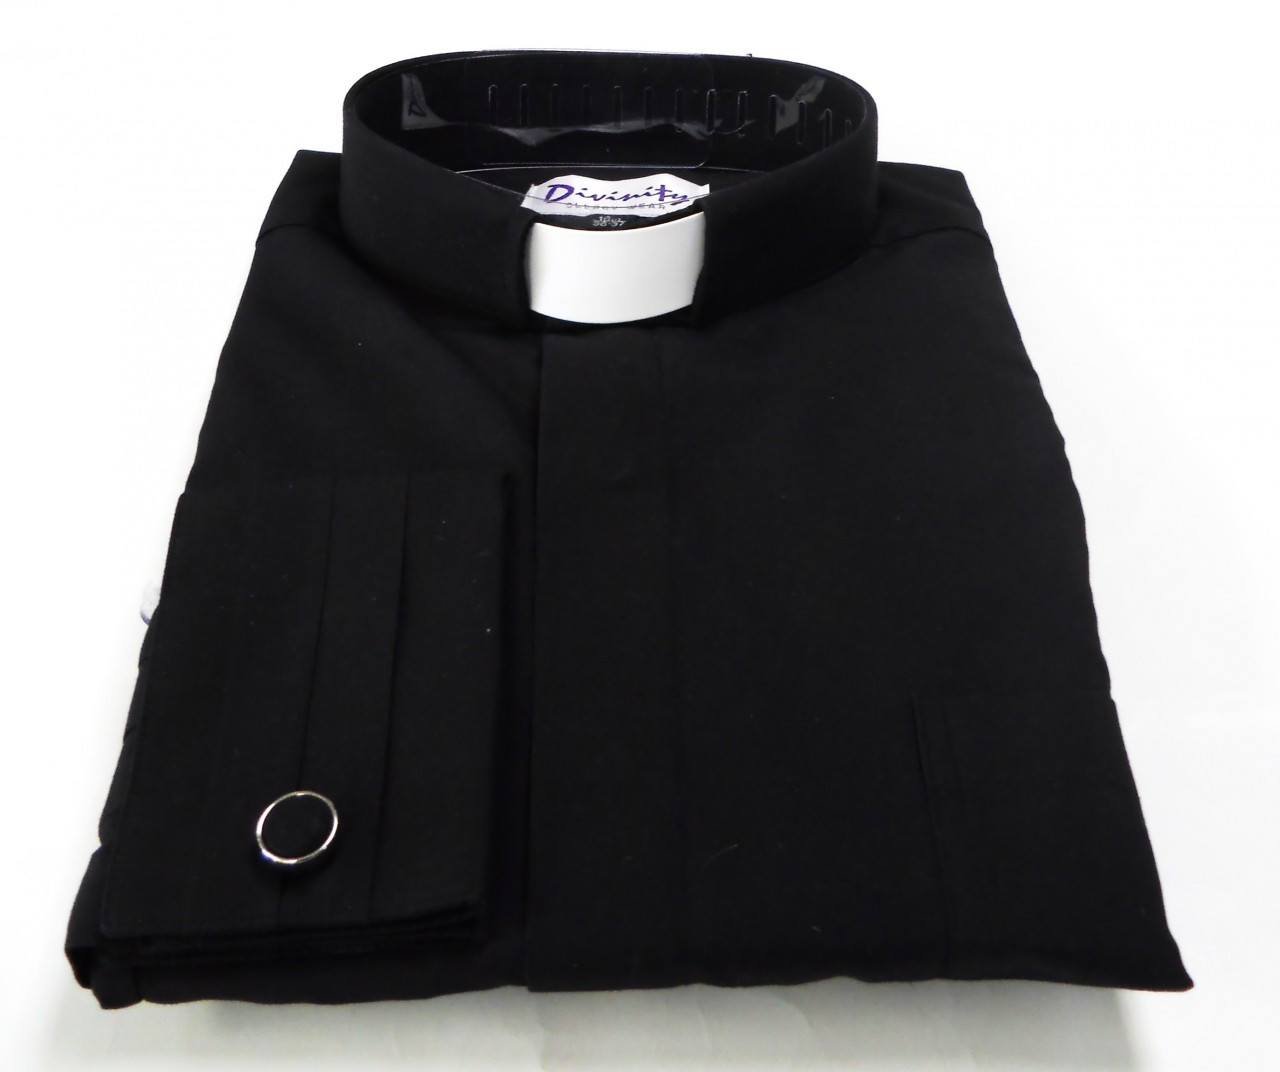 Tab Collar Mens French Cuff Clergy Shirt Clerical Shirt